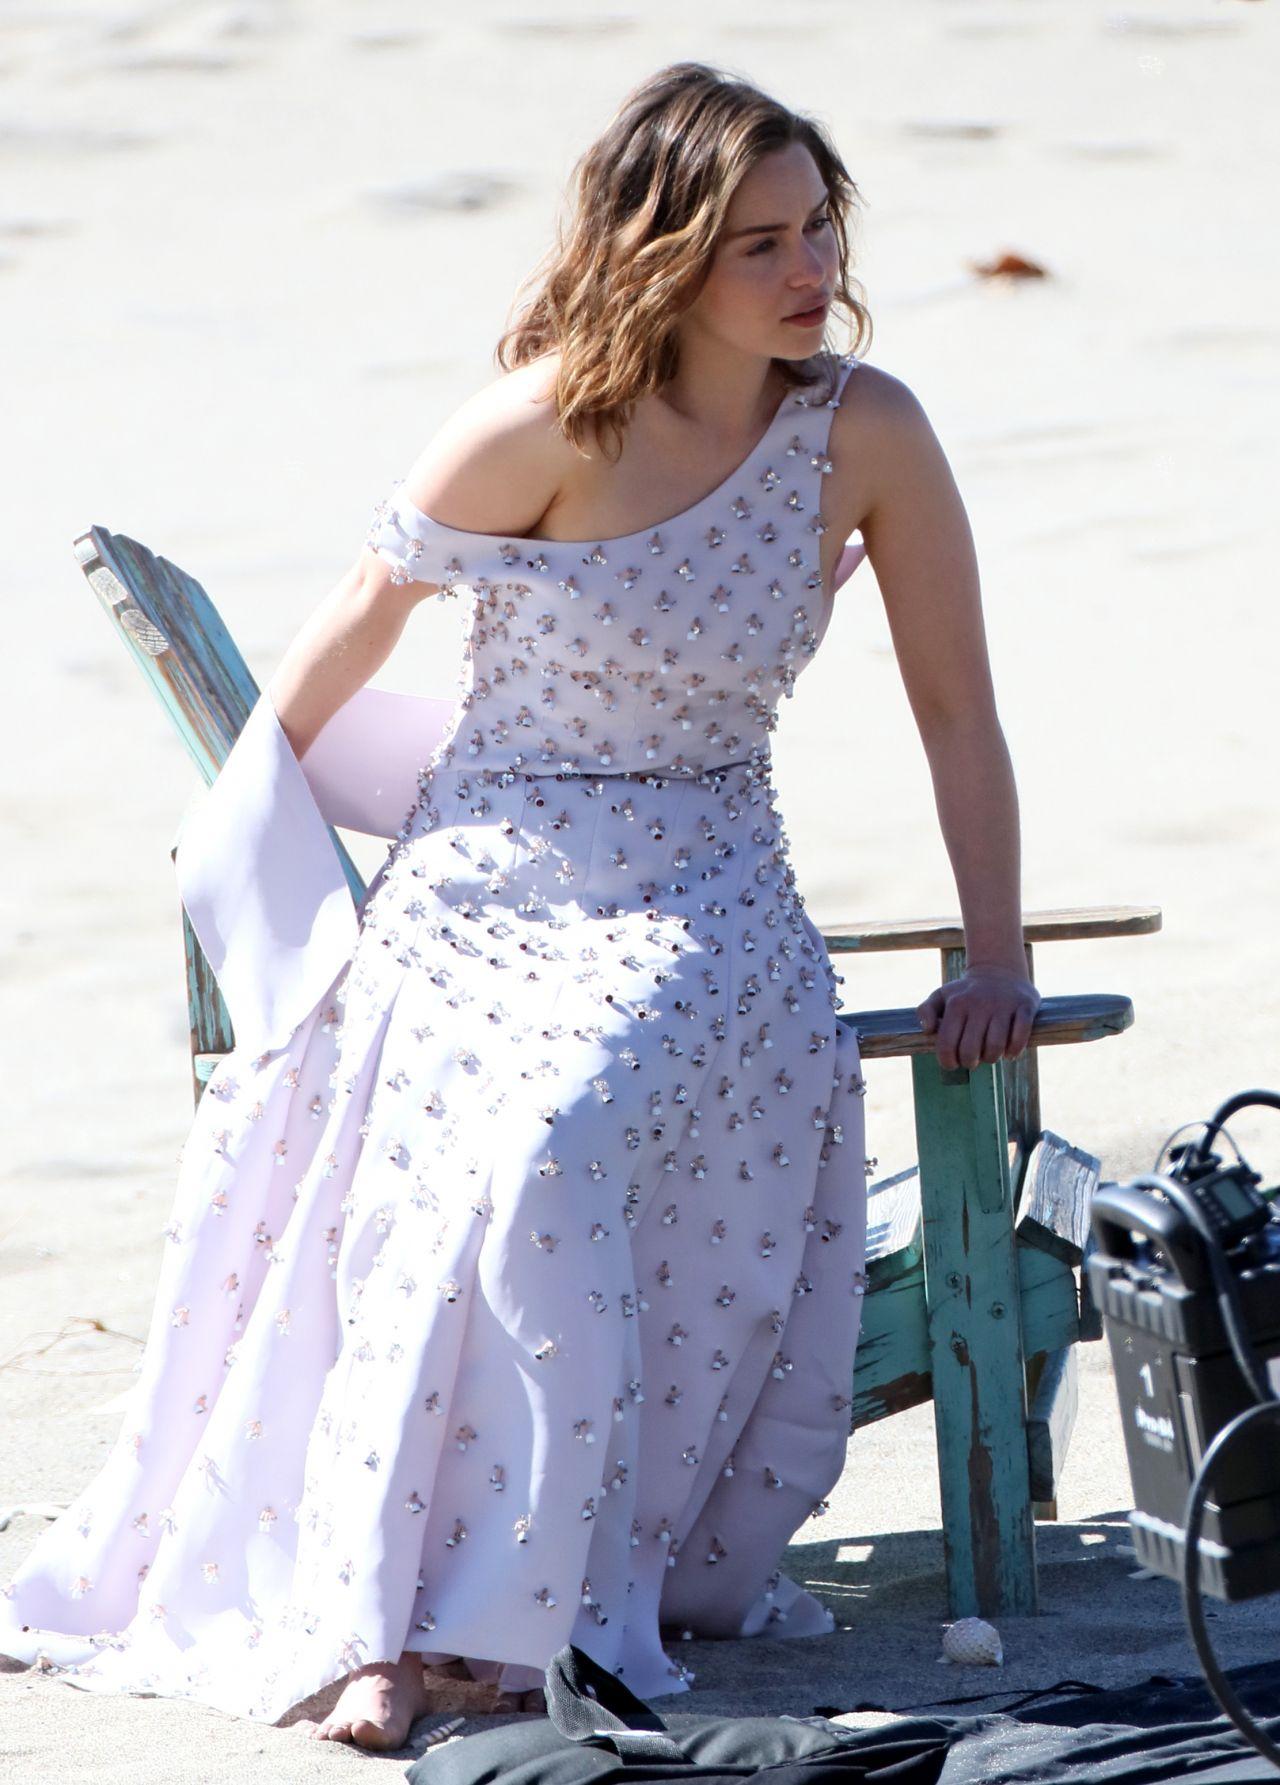 Emilia Clarke - Preparing for a Photo Shoot in Malibu 2/4/2016